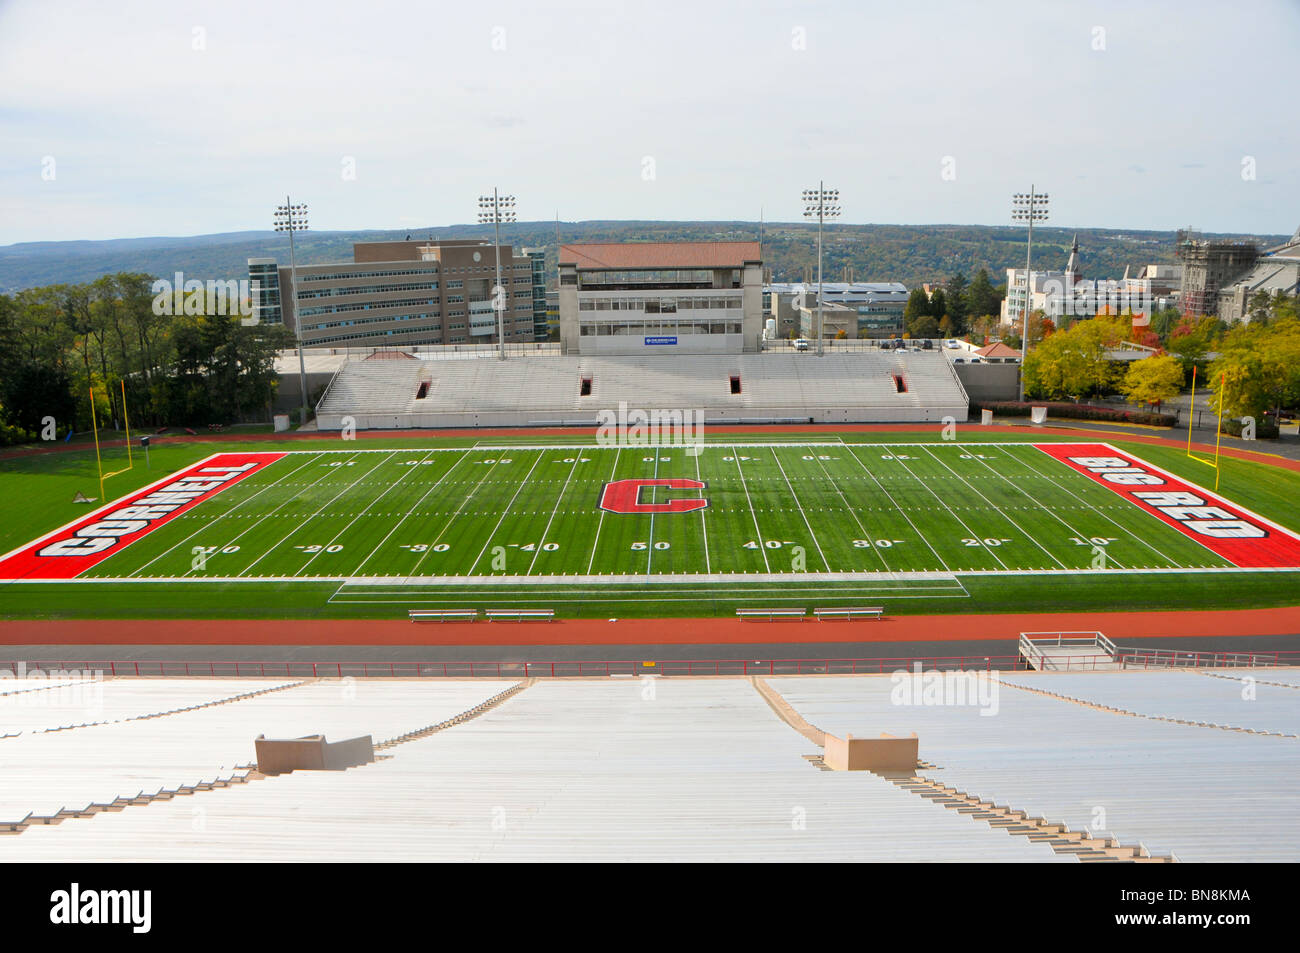 Football Stadium Cornell University Campus Ithaca New York Finger Lakes Region Schoellkopf Memorial - Stock Image